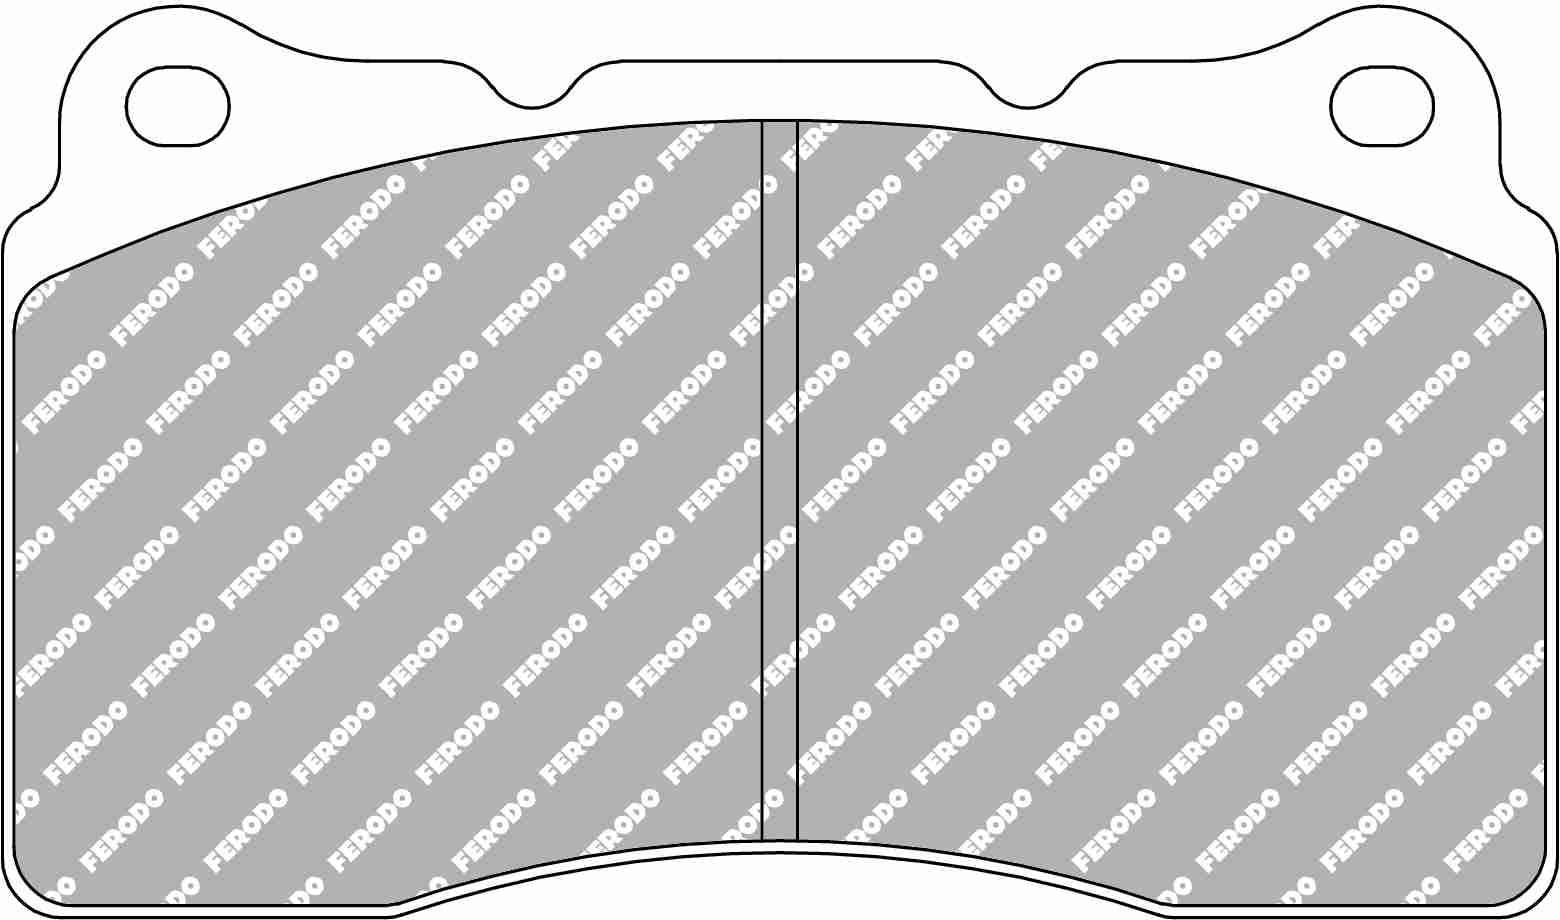 FCP1334Z Car Racing - Brake Pads - Fcp1334